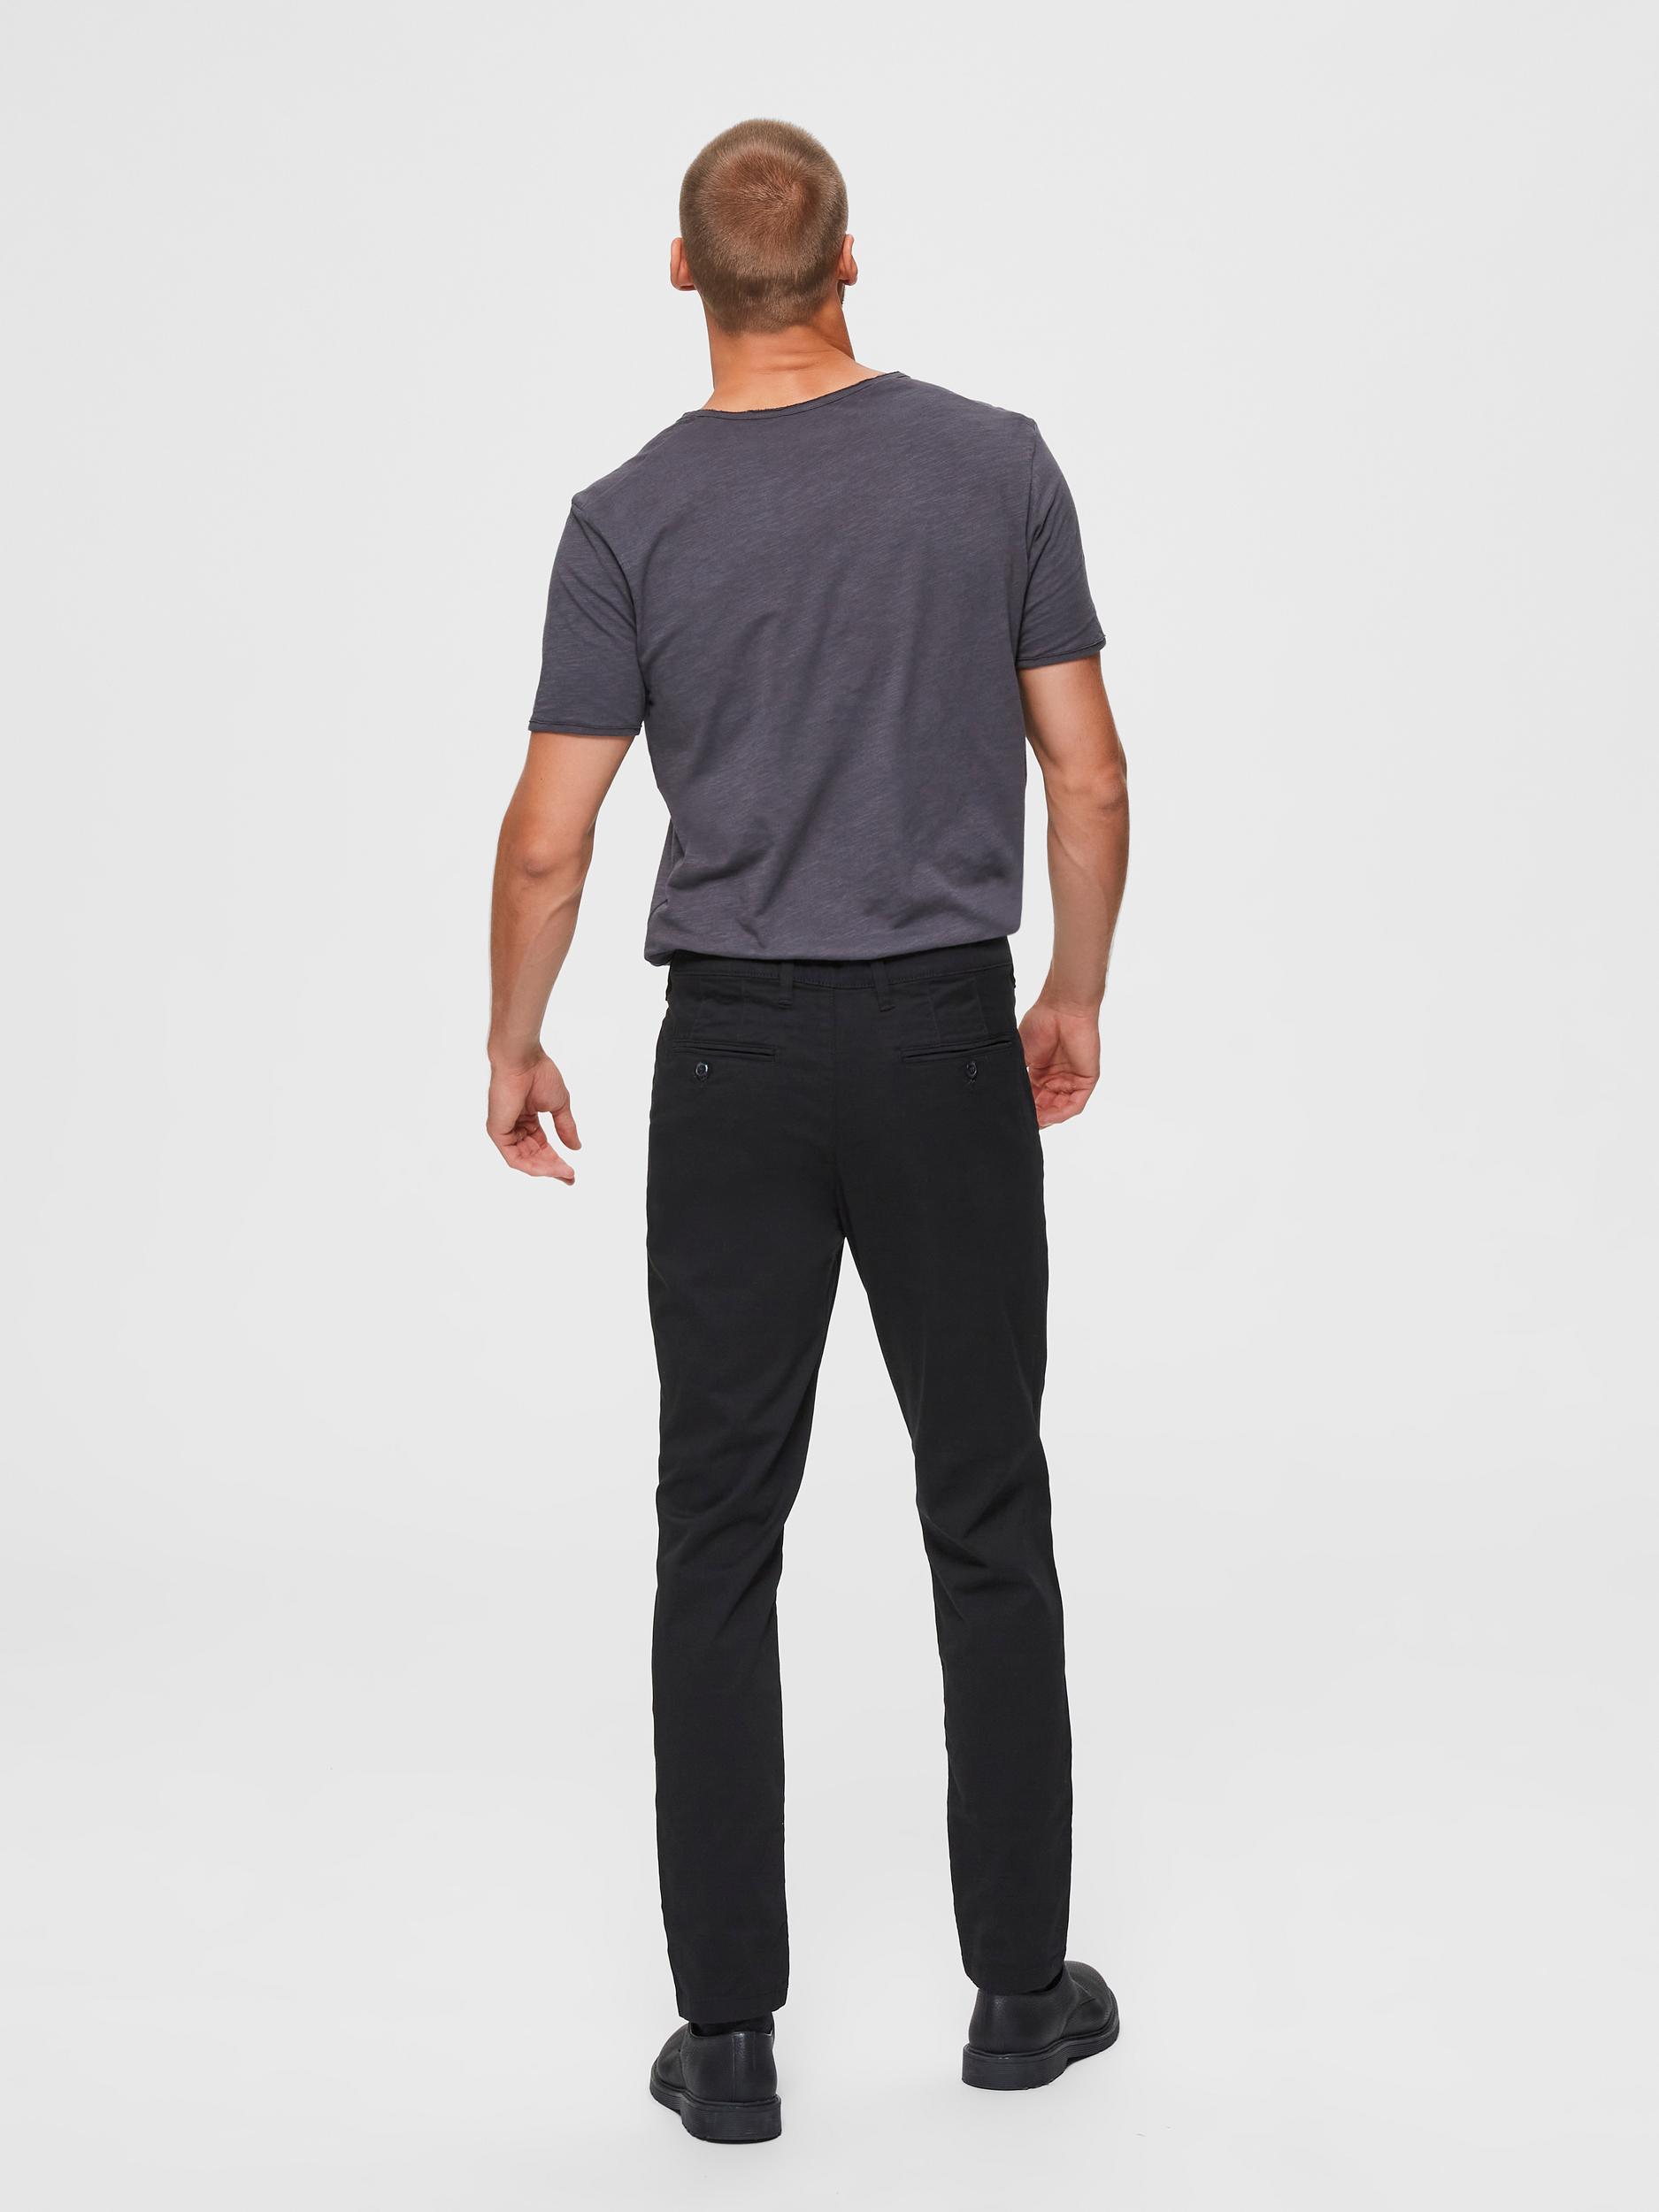 Selected Homme Miles Slim Flex chinos, black, 33/32